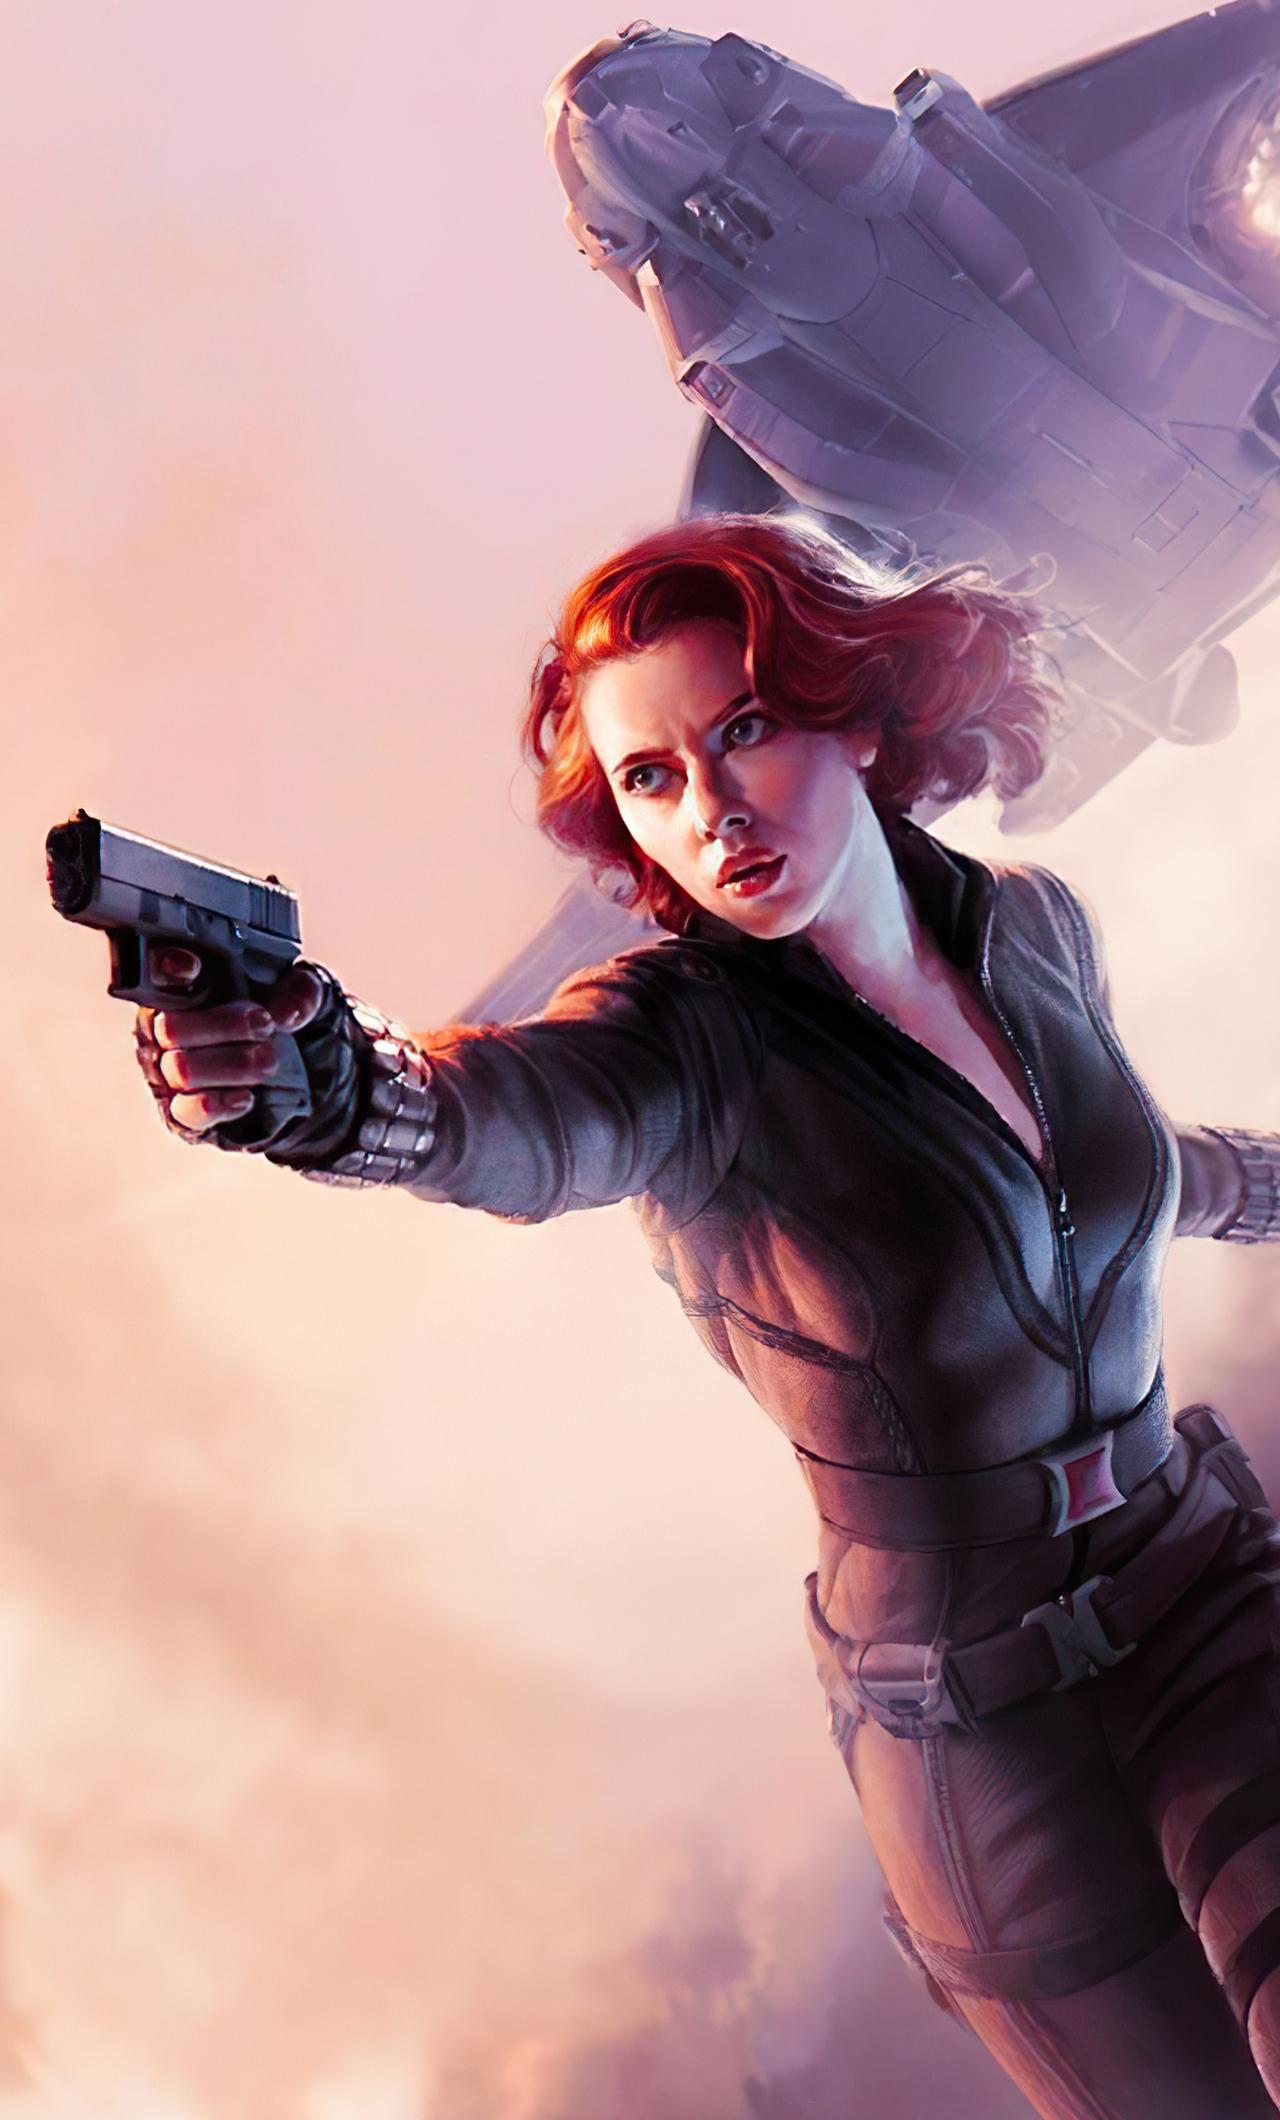 1280x2120 Black Widow With Gun Artwork iPhone 6+ HD 4k ...